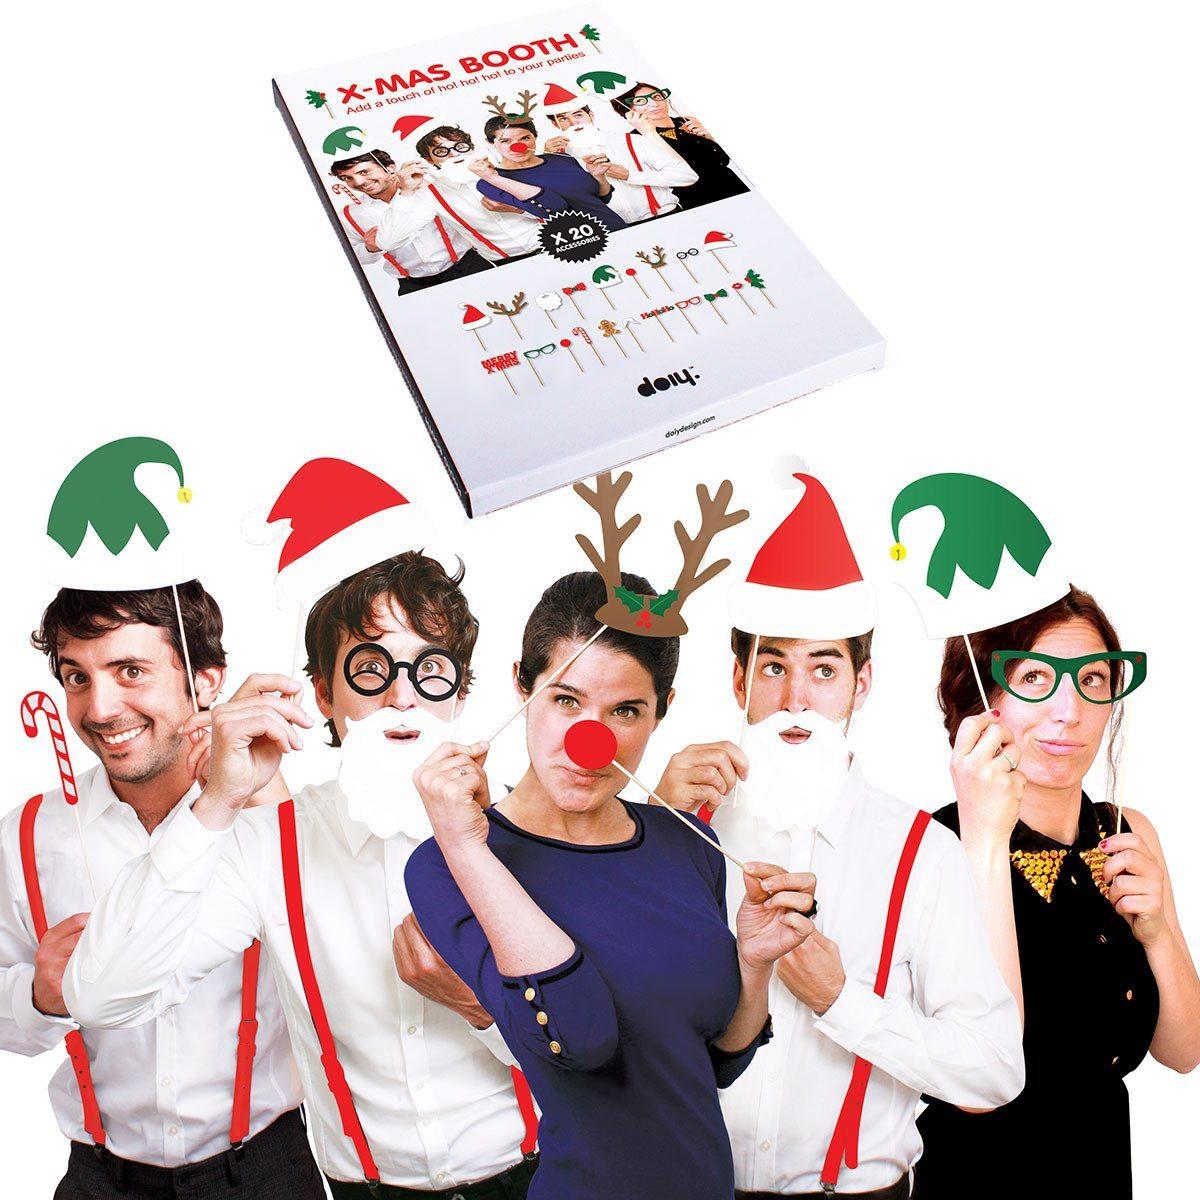 Photo Booth - juleudklædning